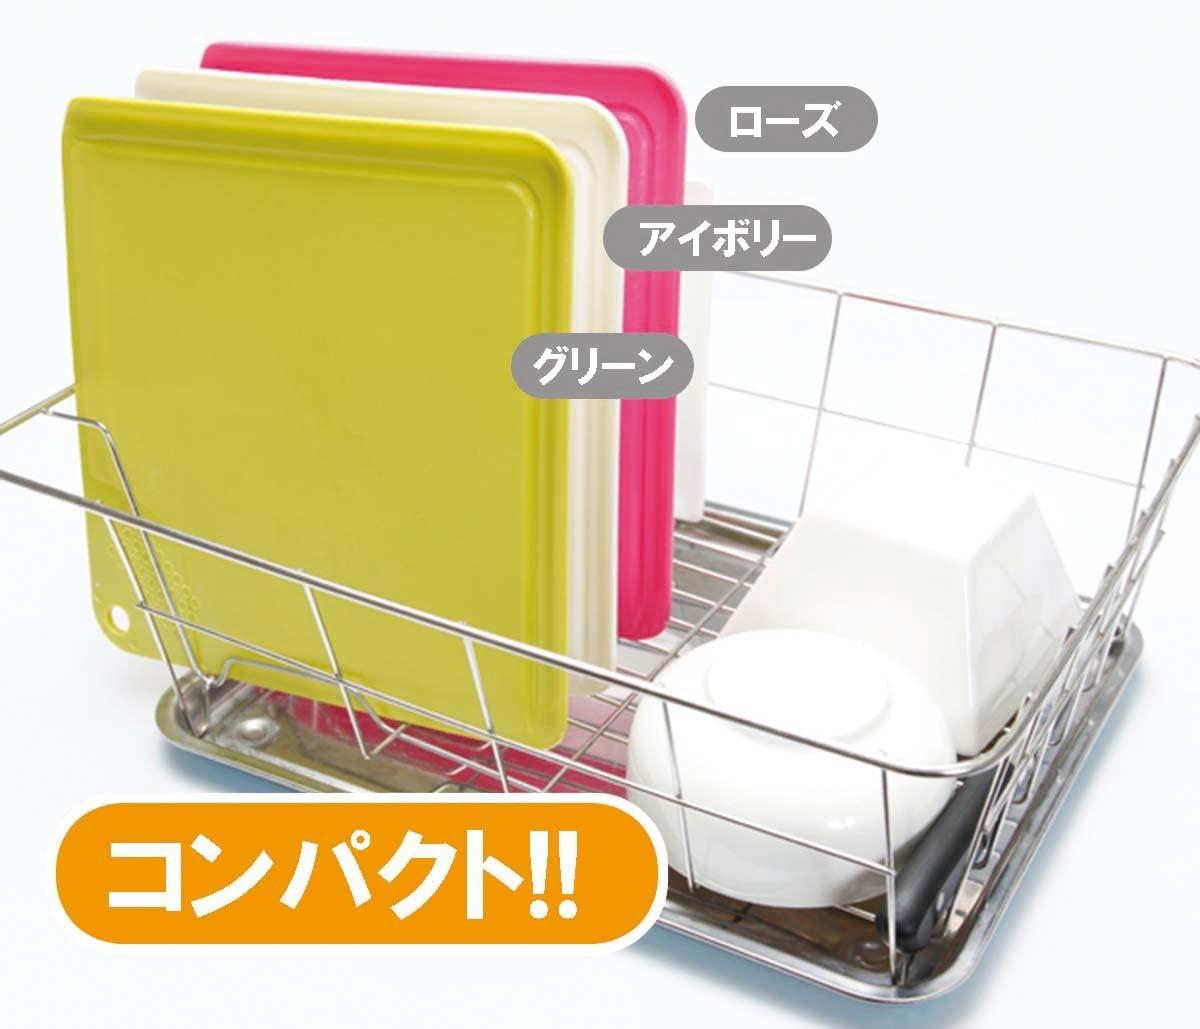 Pre-mier(プレ-ミアー)スマートカッティングボード(袋入り)アイボリー CB10の商品画像6